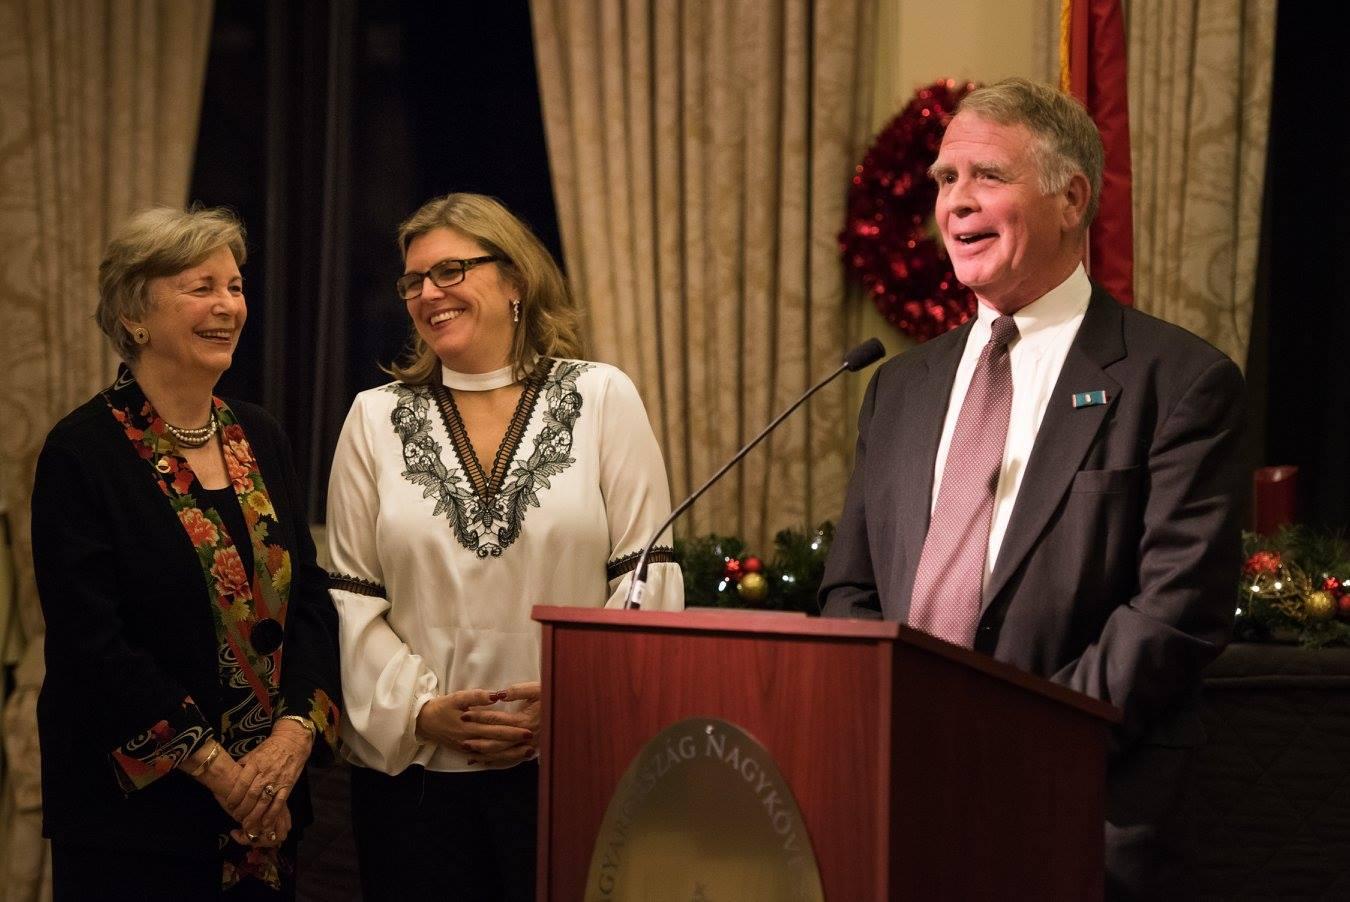 Coalition Chair Emerita Mrs. Edith K. Lauer and Coalition President Mrs. Andrea Lauer Rice recognizing Ambassador Thomas Robertson